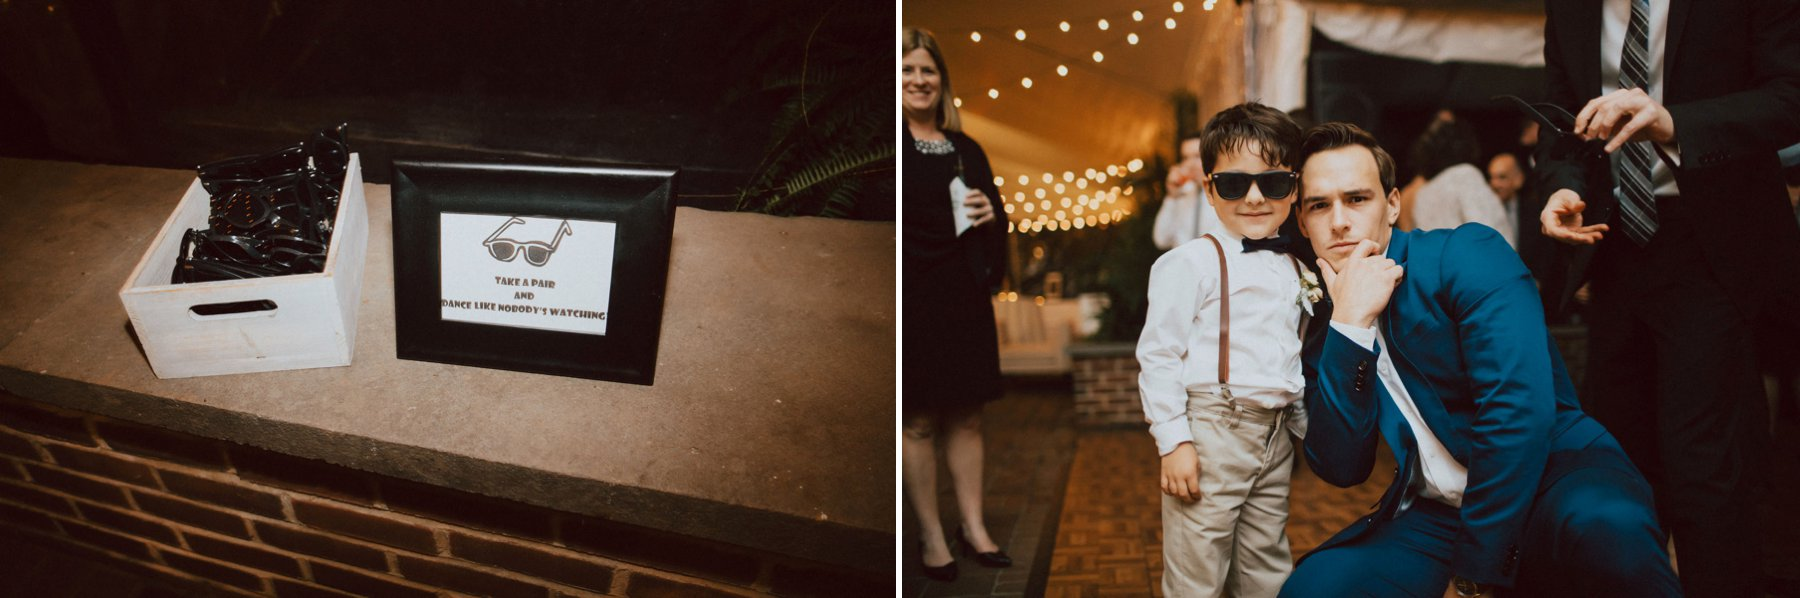 greenville-country-club-wedding-149.jpg